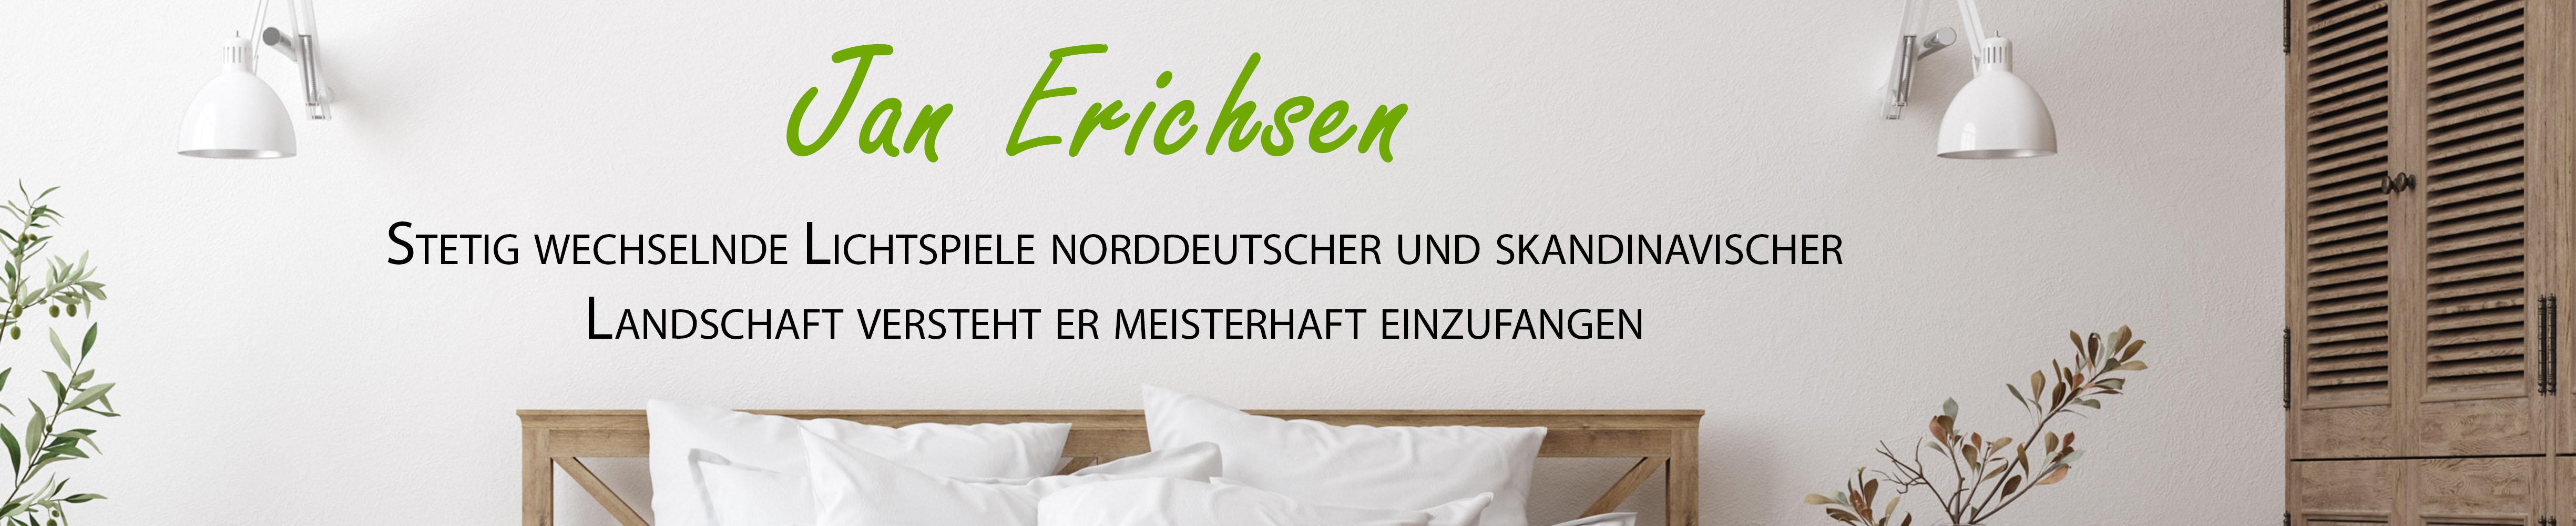 Kategorie: Jan Erichsen